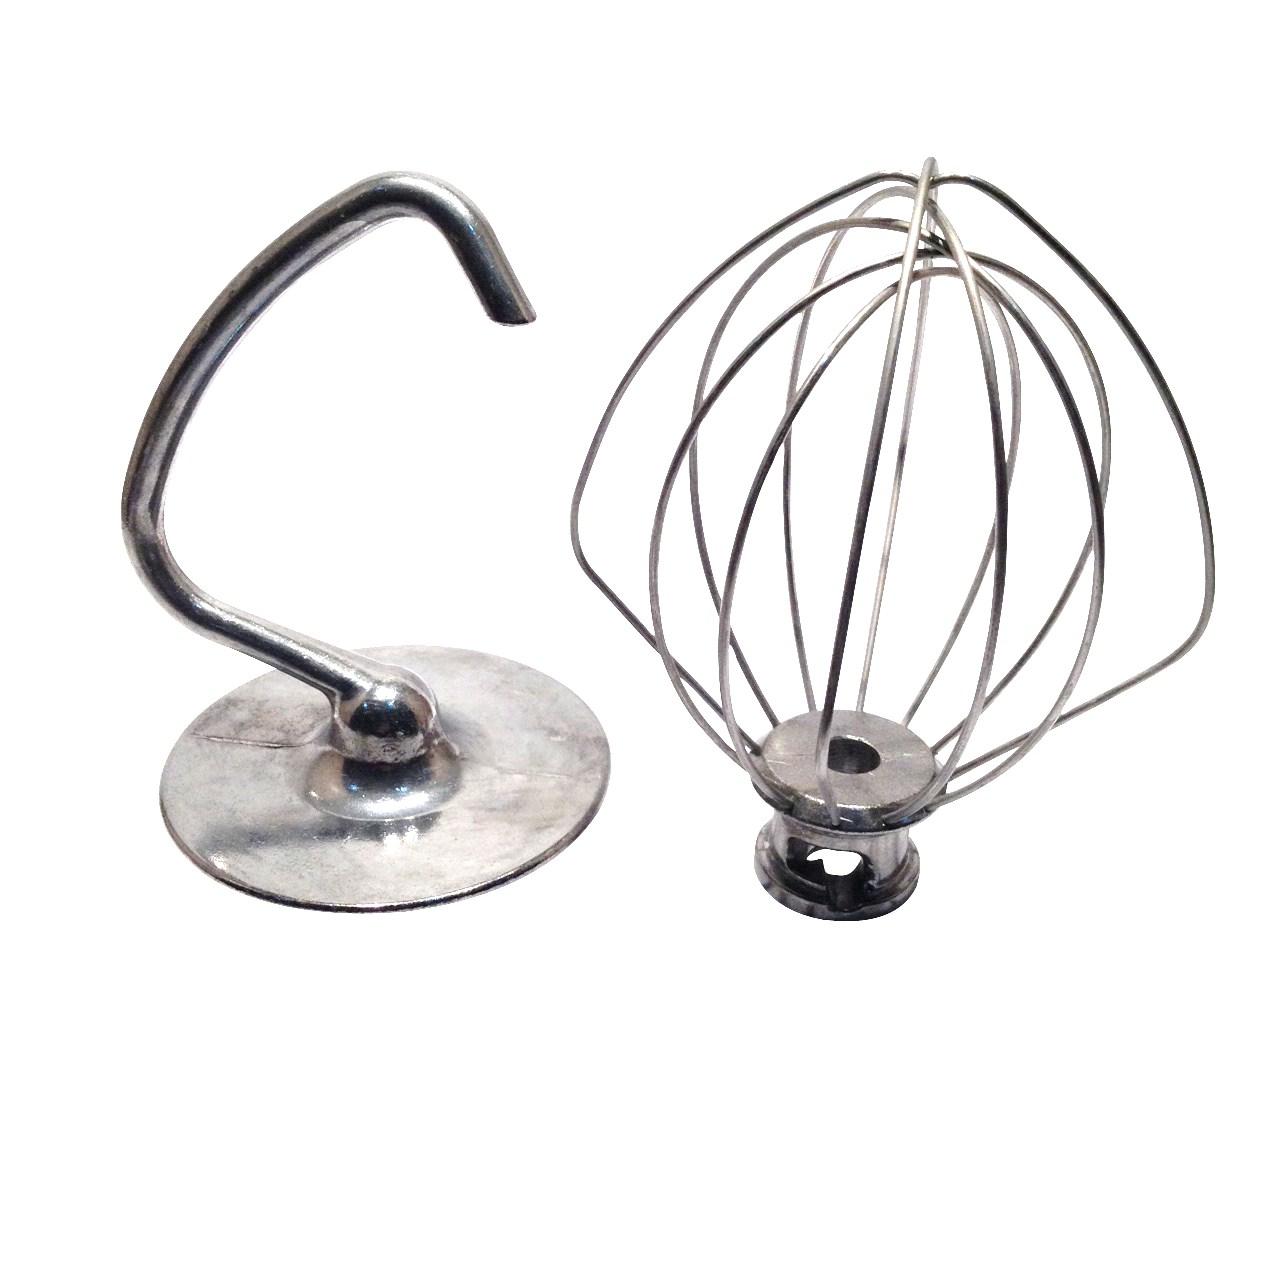 Kitchenaid artisan burnished dough hook k45bdh wire whisk k45ww lana 39 s kenwood kitchenaid - Kitchenaid artisan stand mixer parts ...